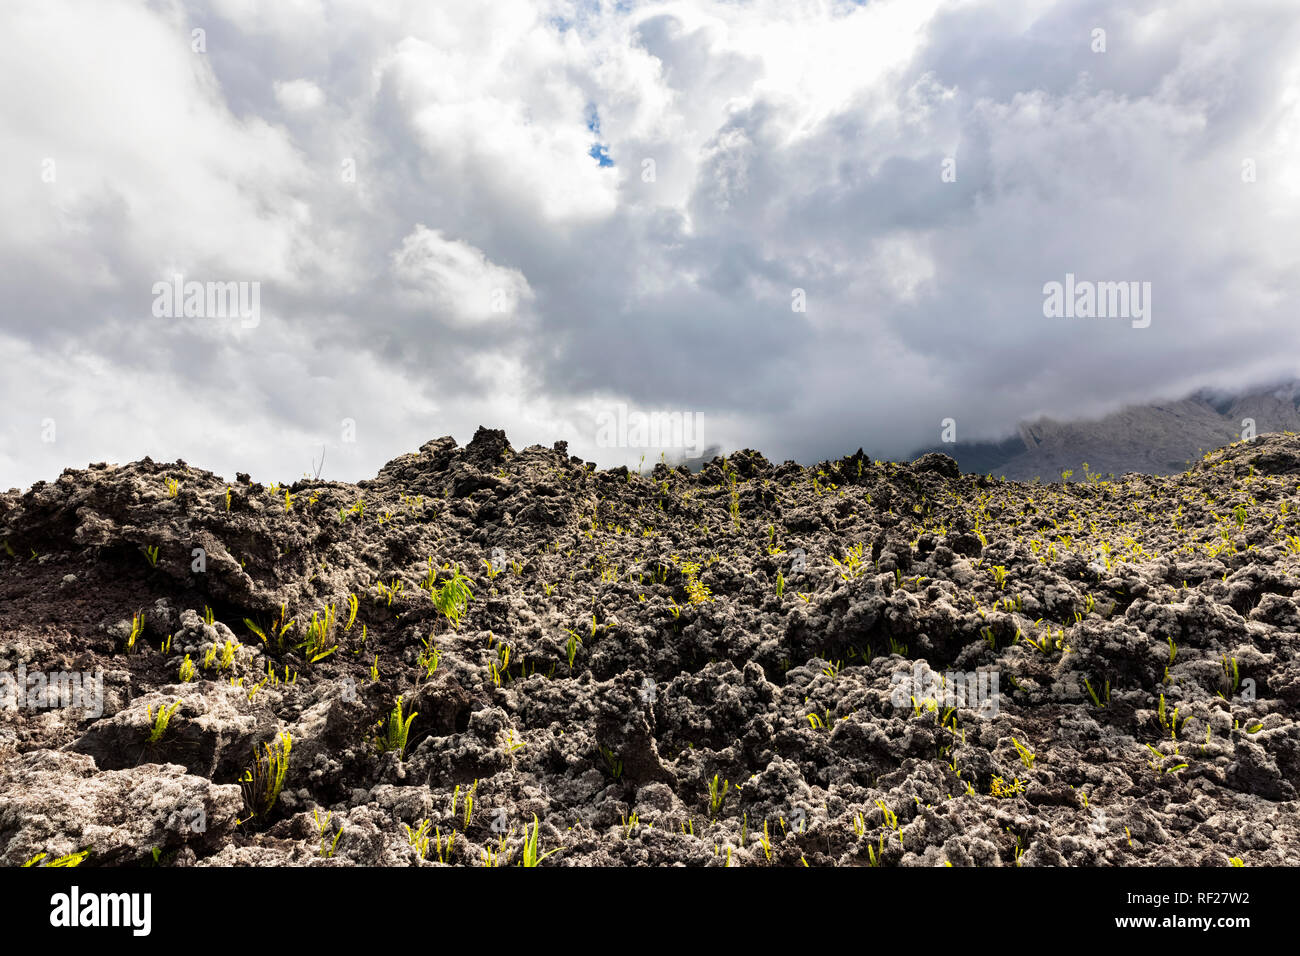 Reunion, Piton de la Fournaise, Grand Brule, Lava field - Stock Image